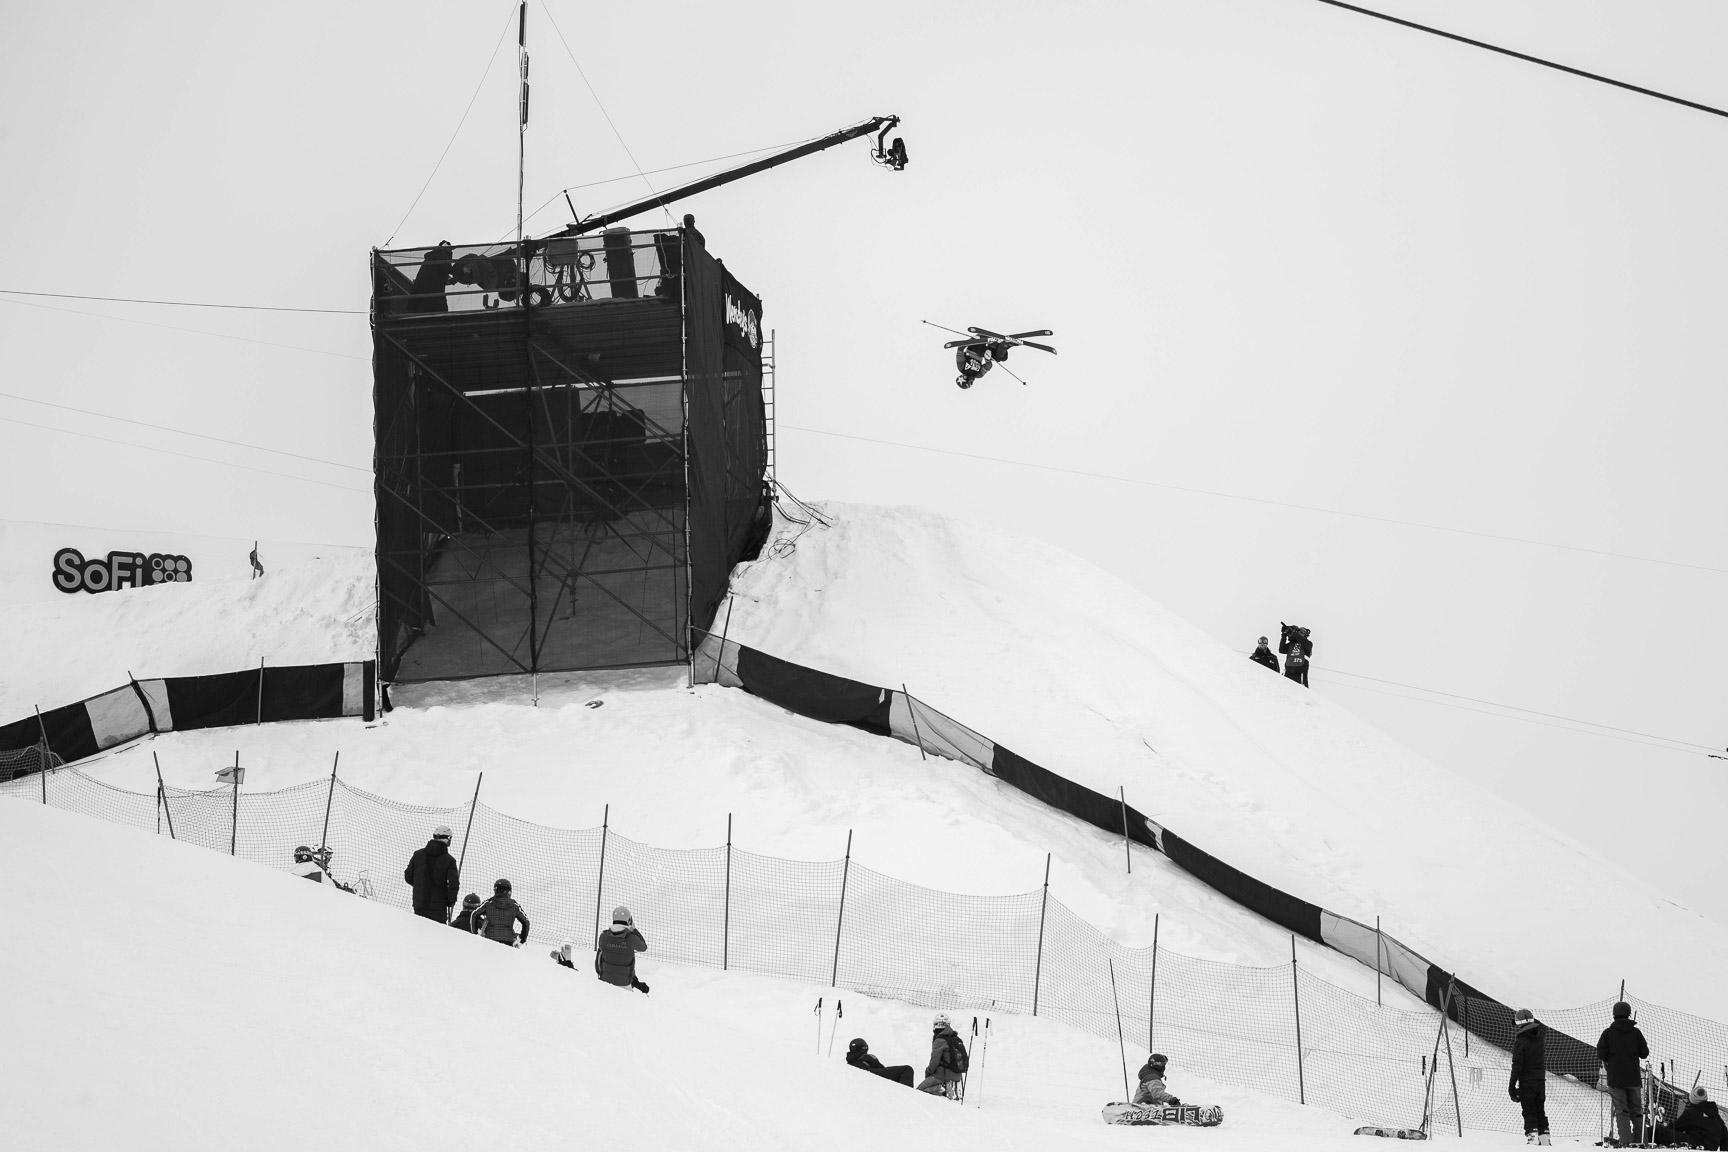 Alex Hall, Men's Ski Slopestyle